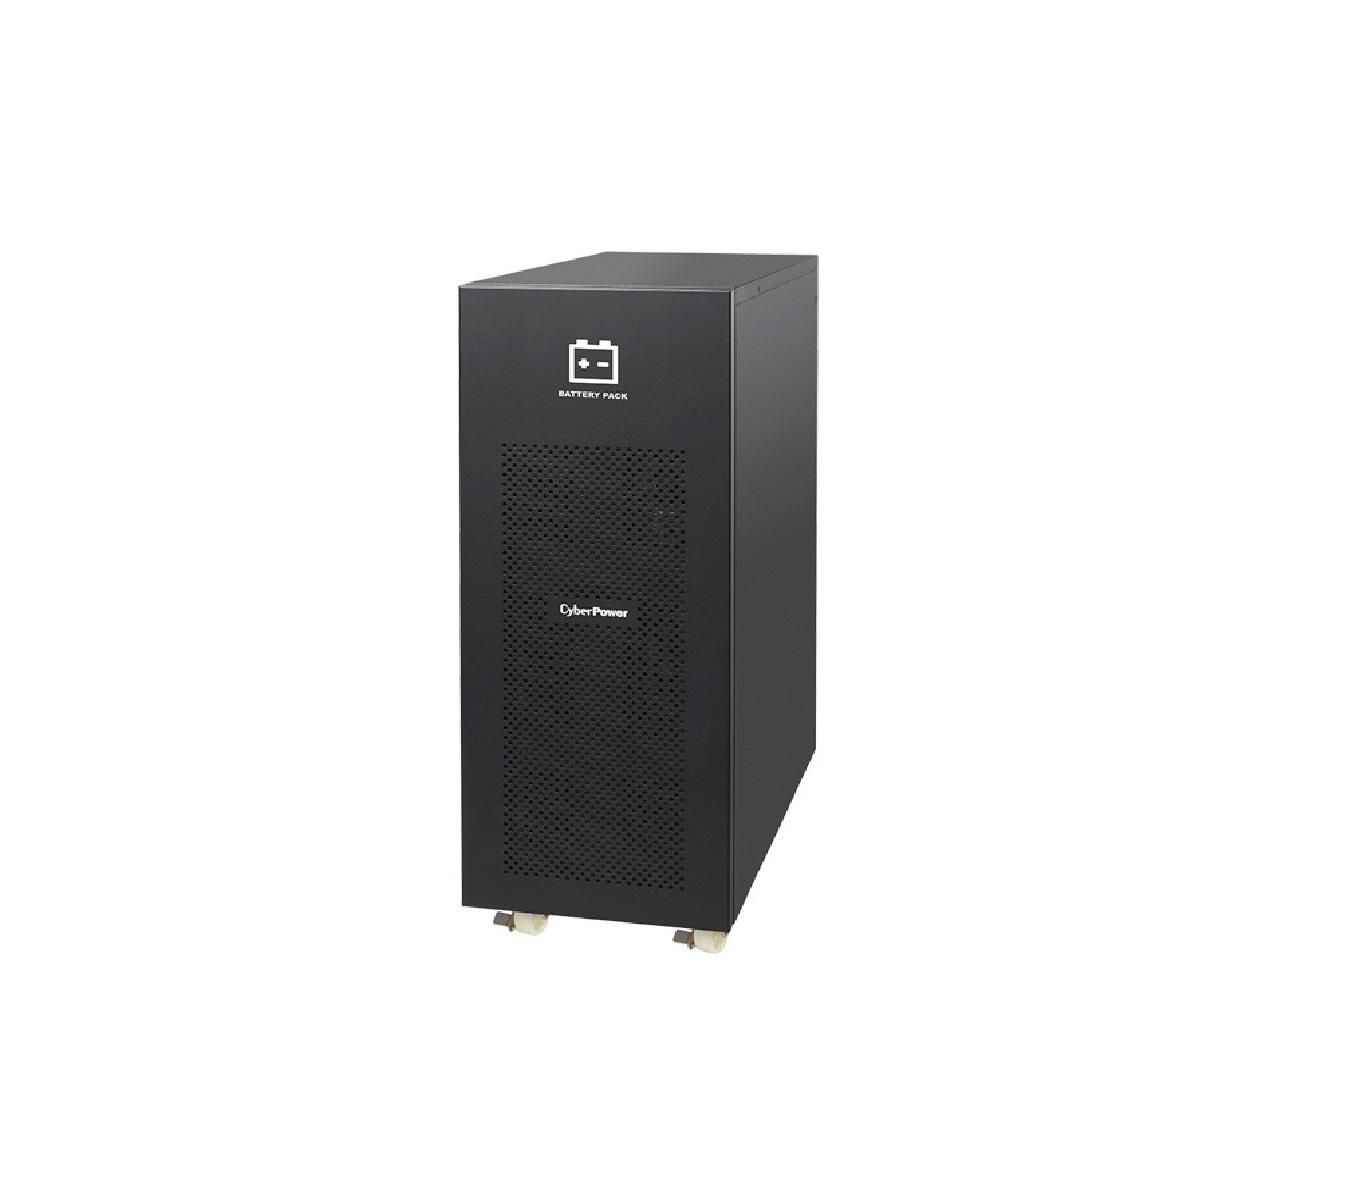 Bộ nguồn ắc quy CyberPower BPSE240V47A